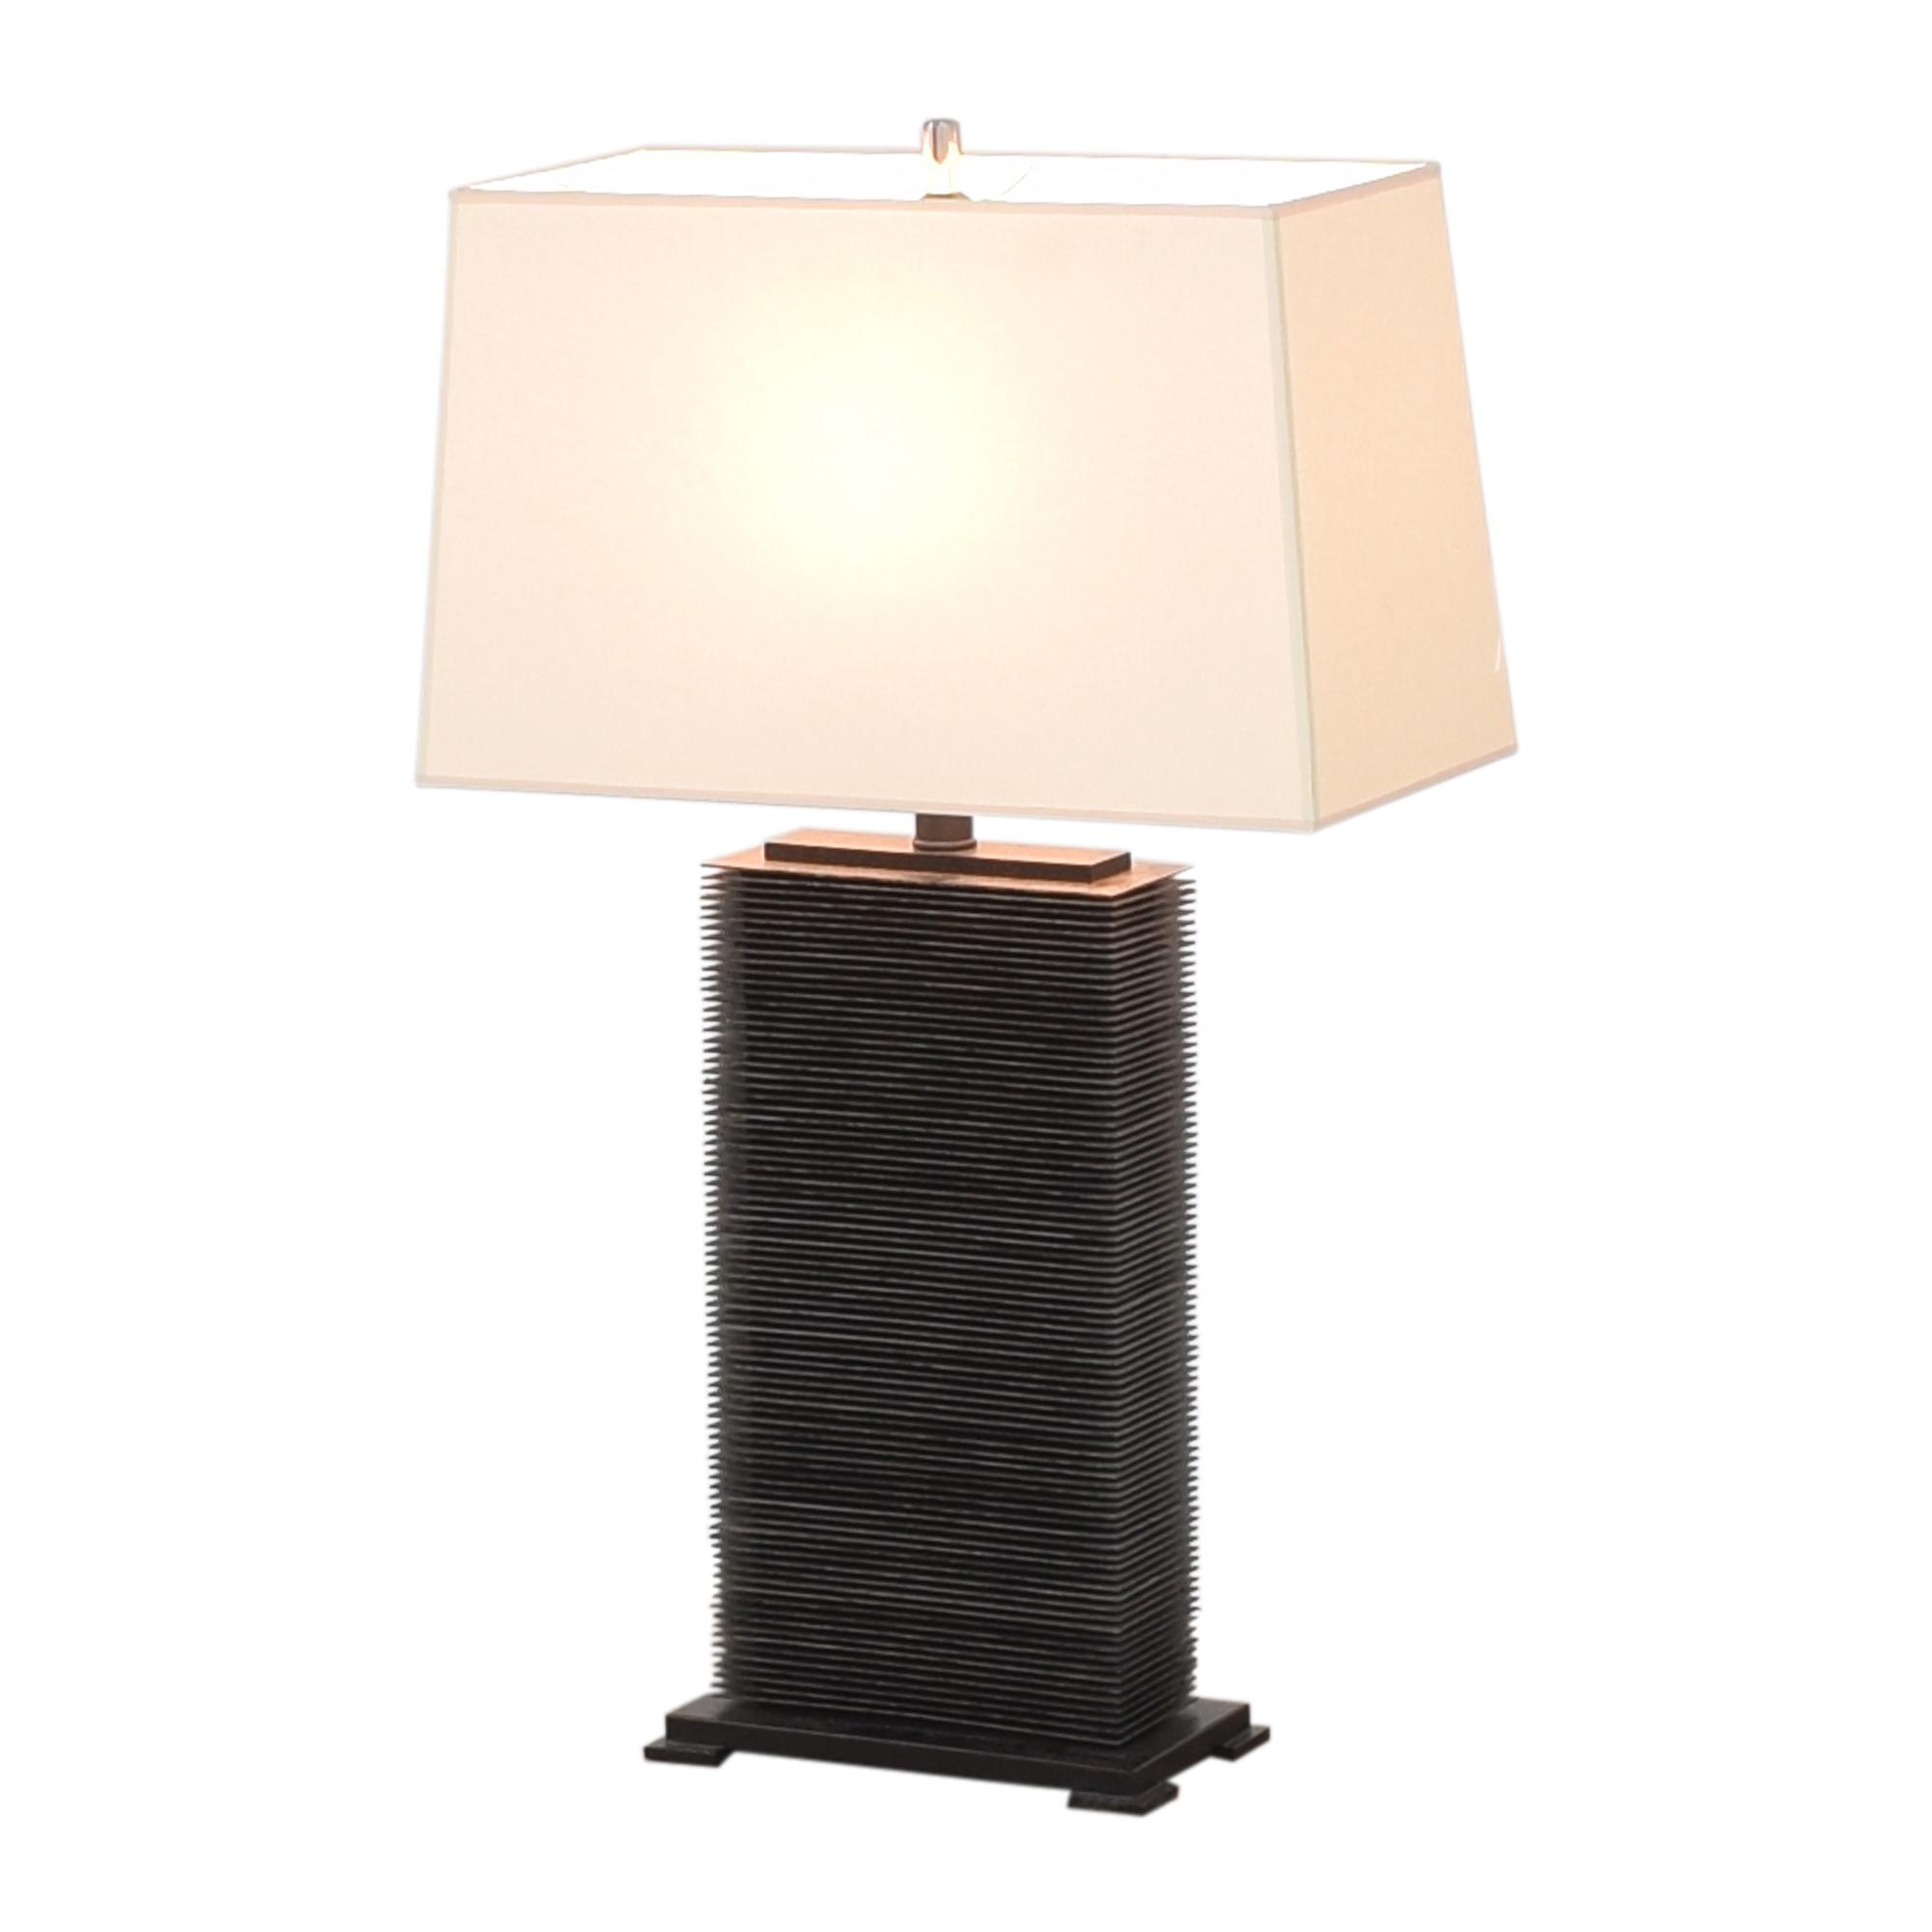 Visual Comfort E.F. Chapman Convector Table Lamp / Decor